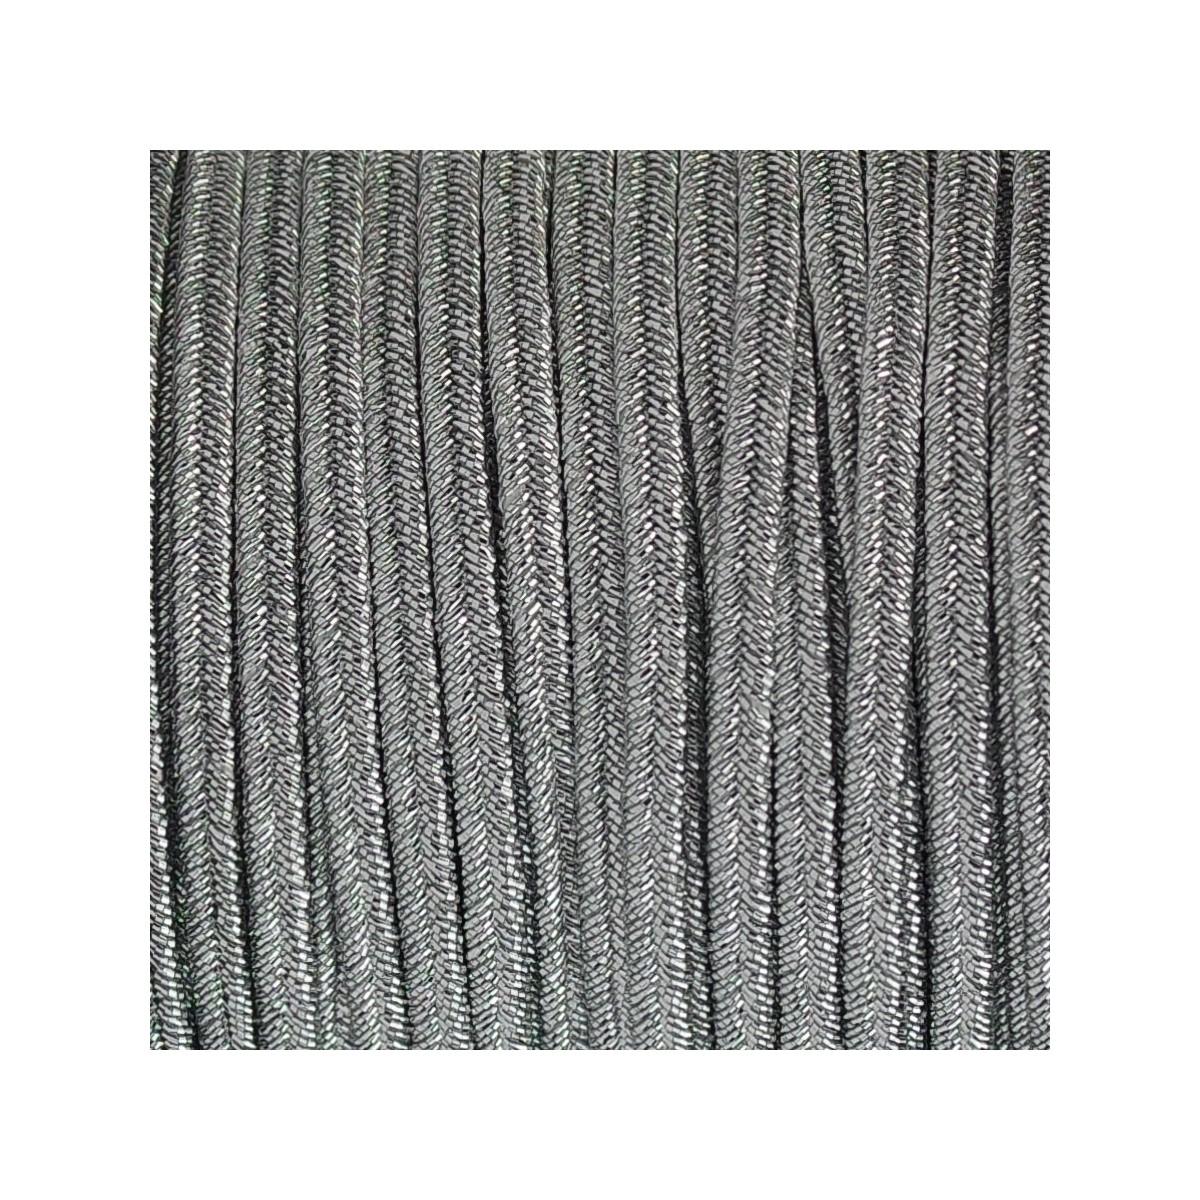 Soutache SNAKE PISA mm 3,0 x 2mt